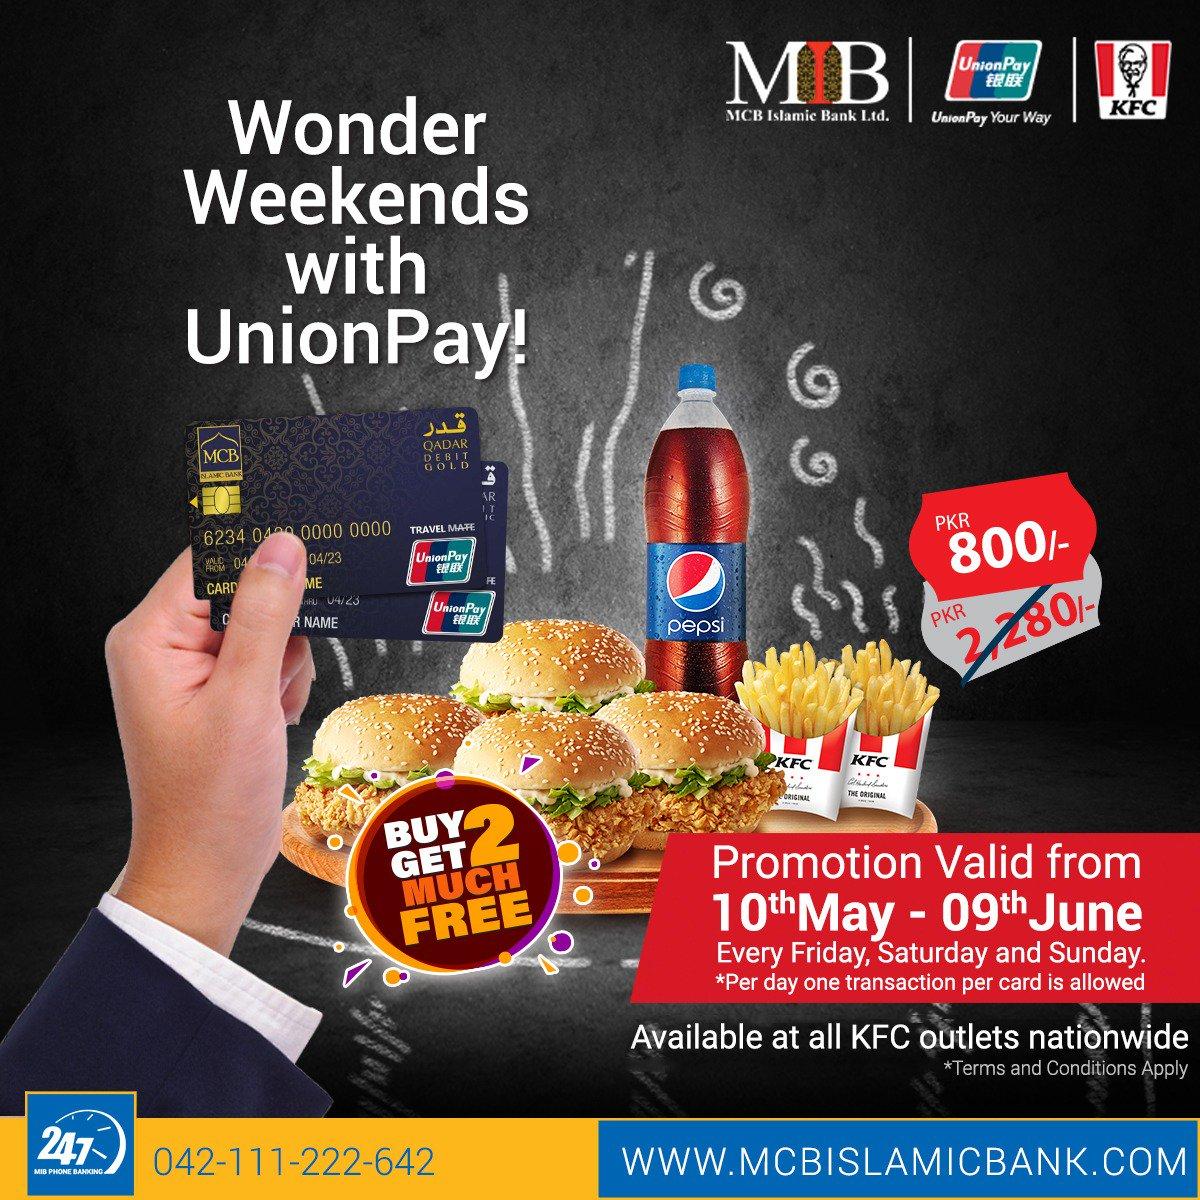 Mcb Islamic Bank At Mcbislamicbank Twitter